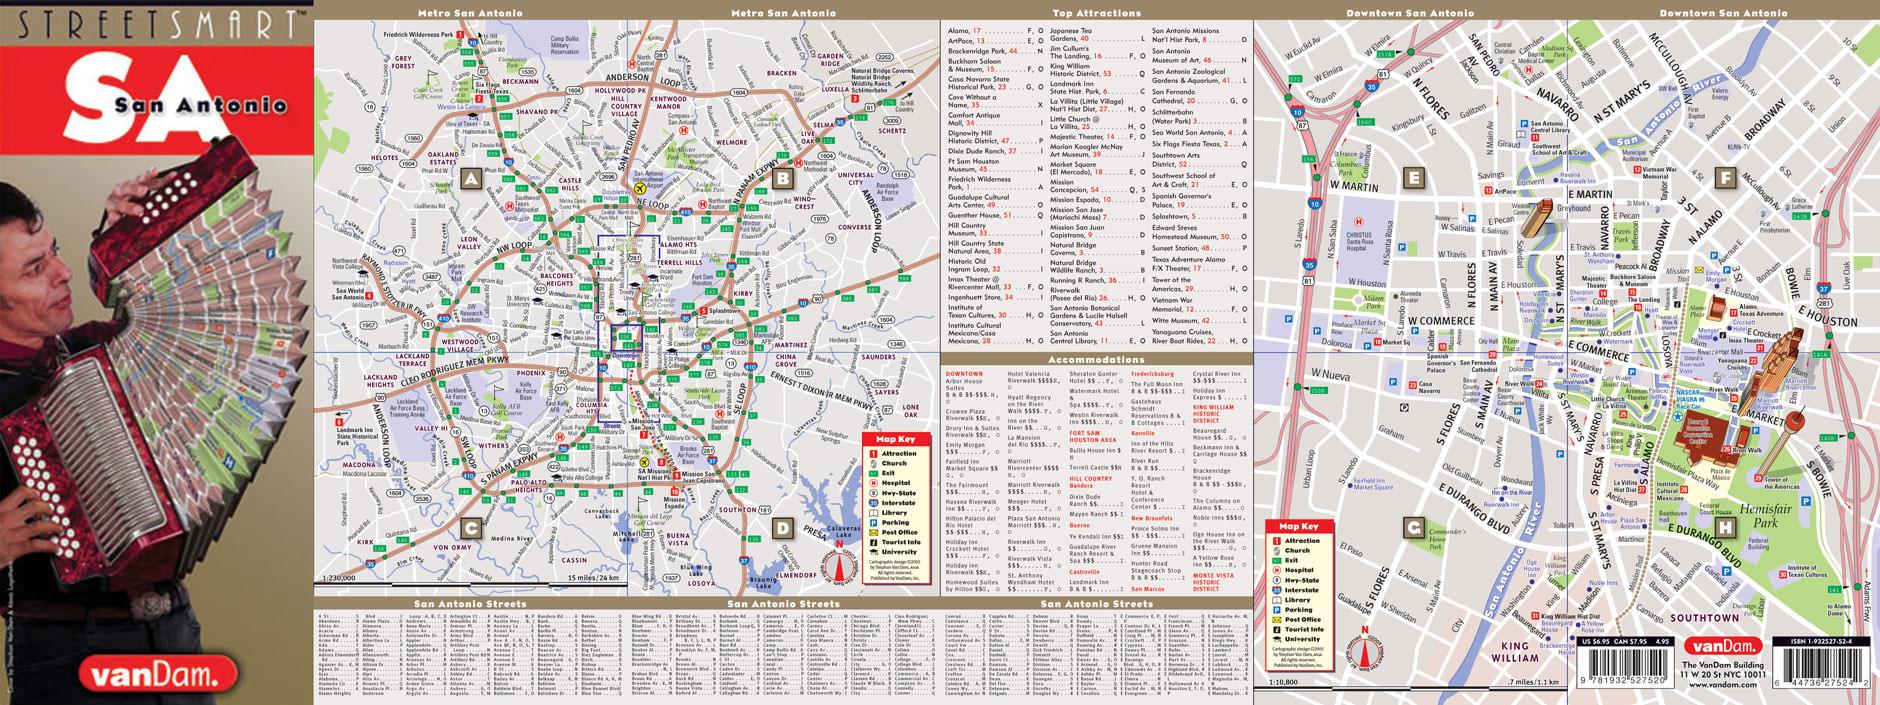 VanDam San Antonio StreetSmart Map